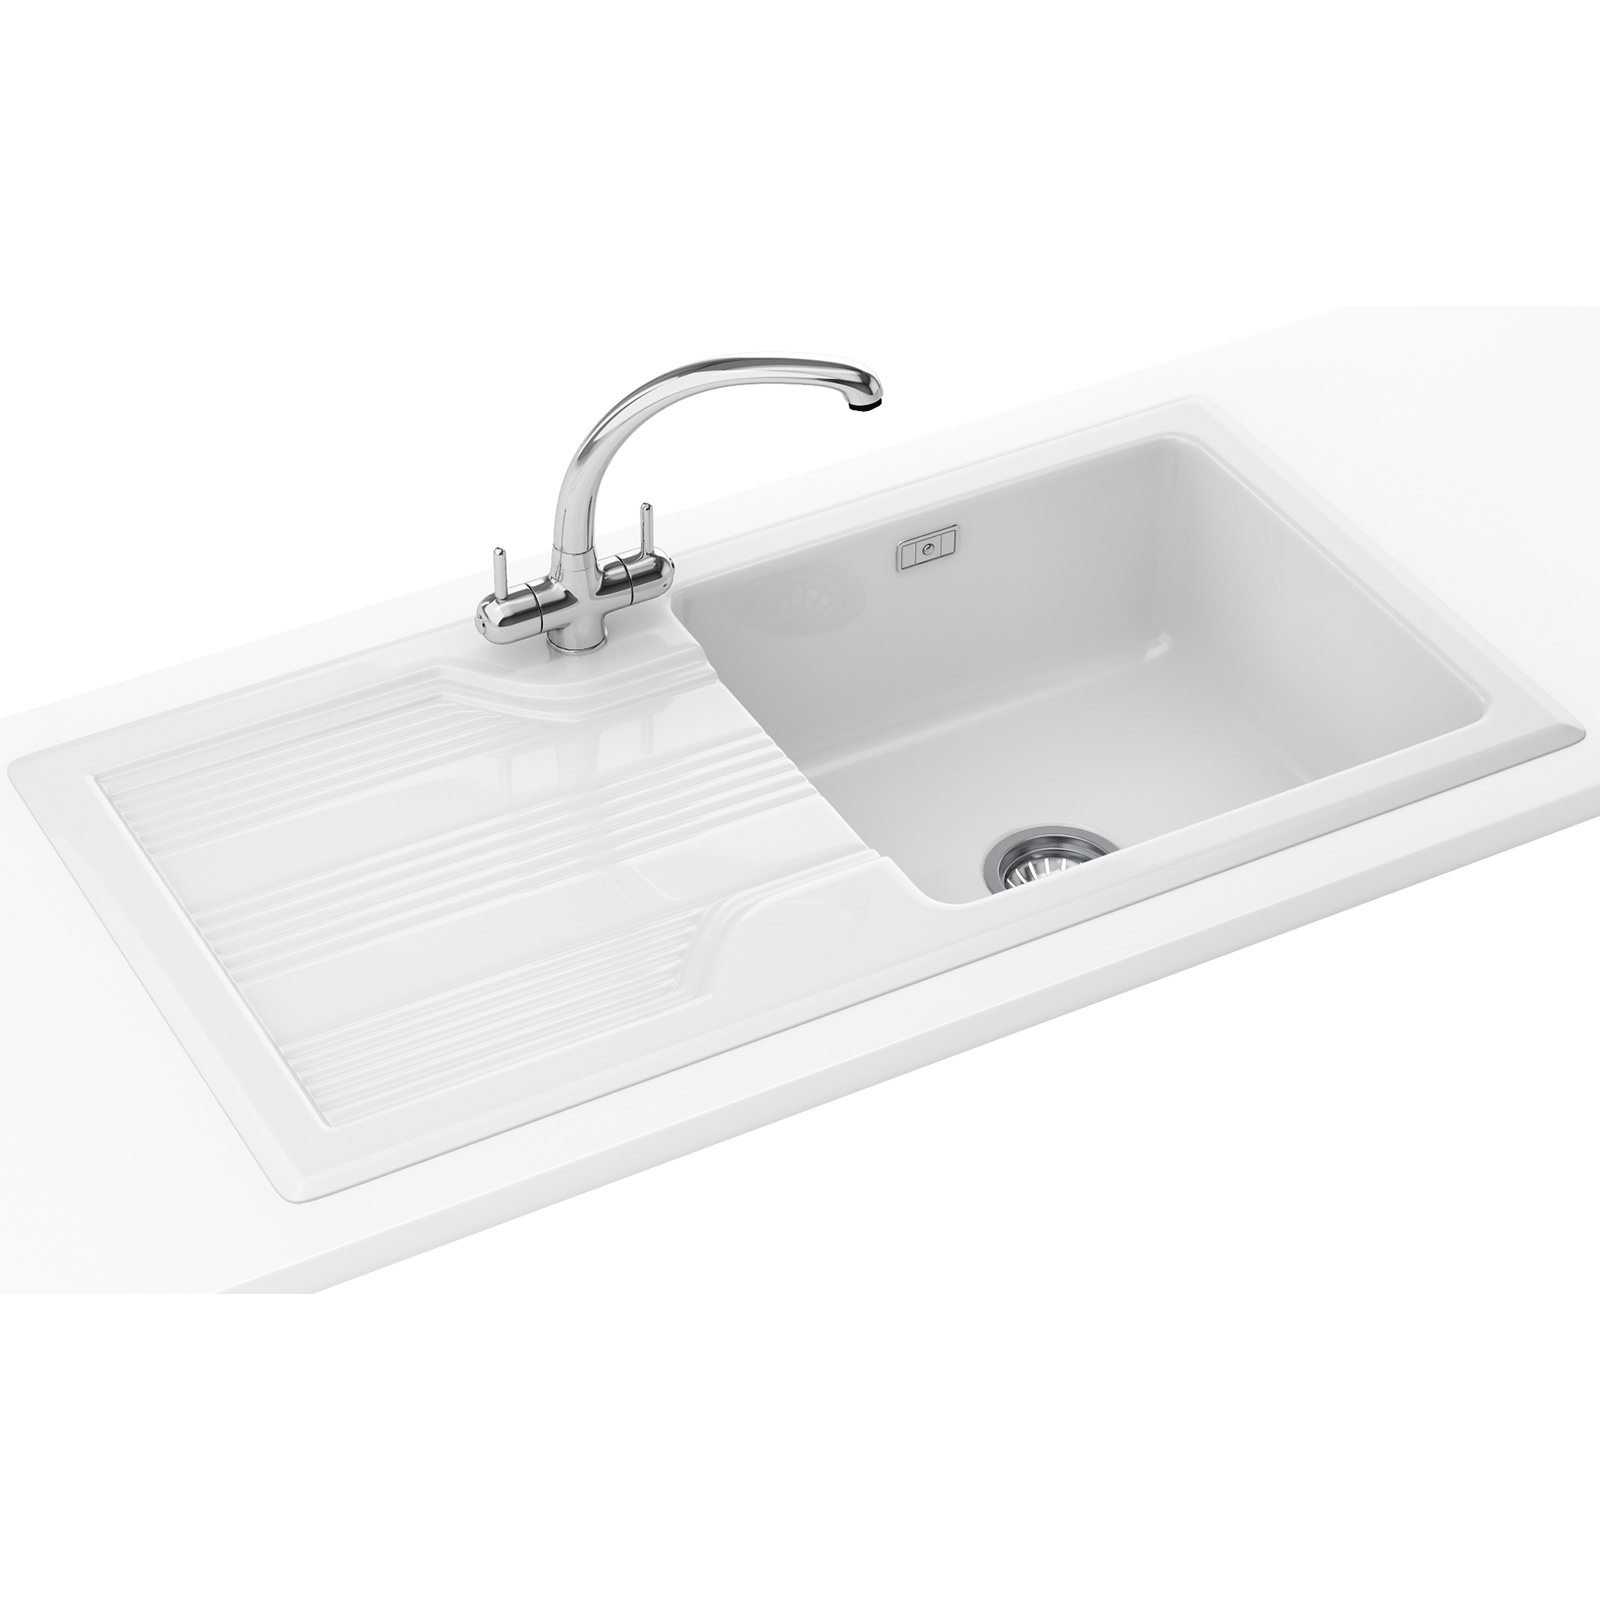 Franke Inset Sink : Franke Galassia Propack GAK 611 Ceramic White Inset Sink And Tap 124 ...